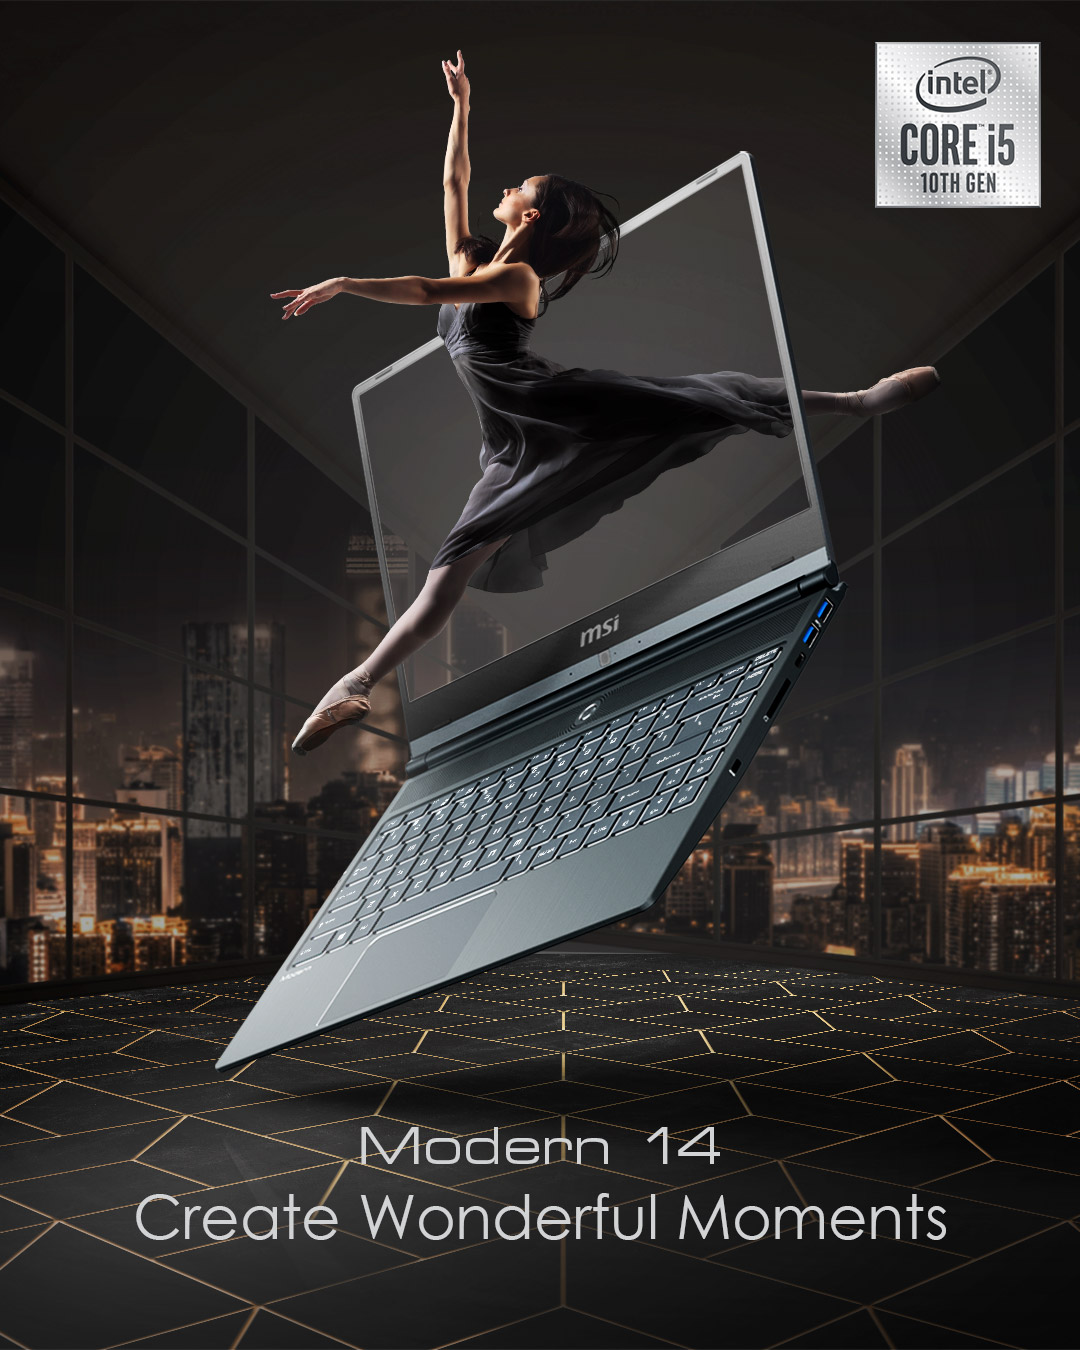 Modern 14